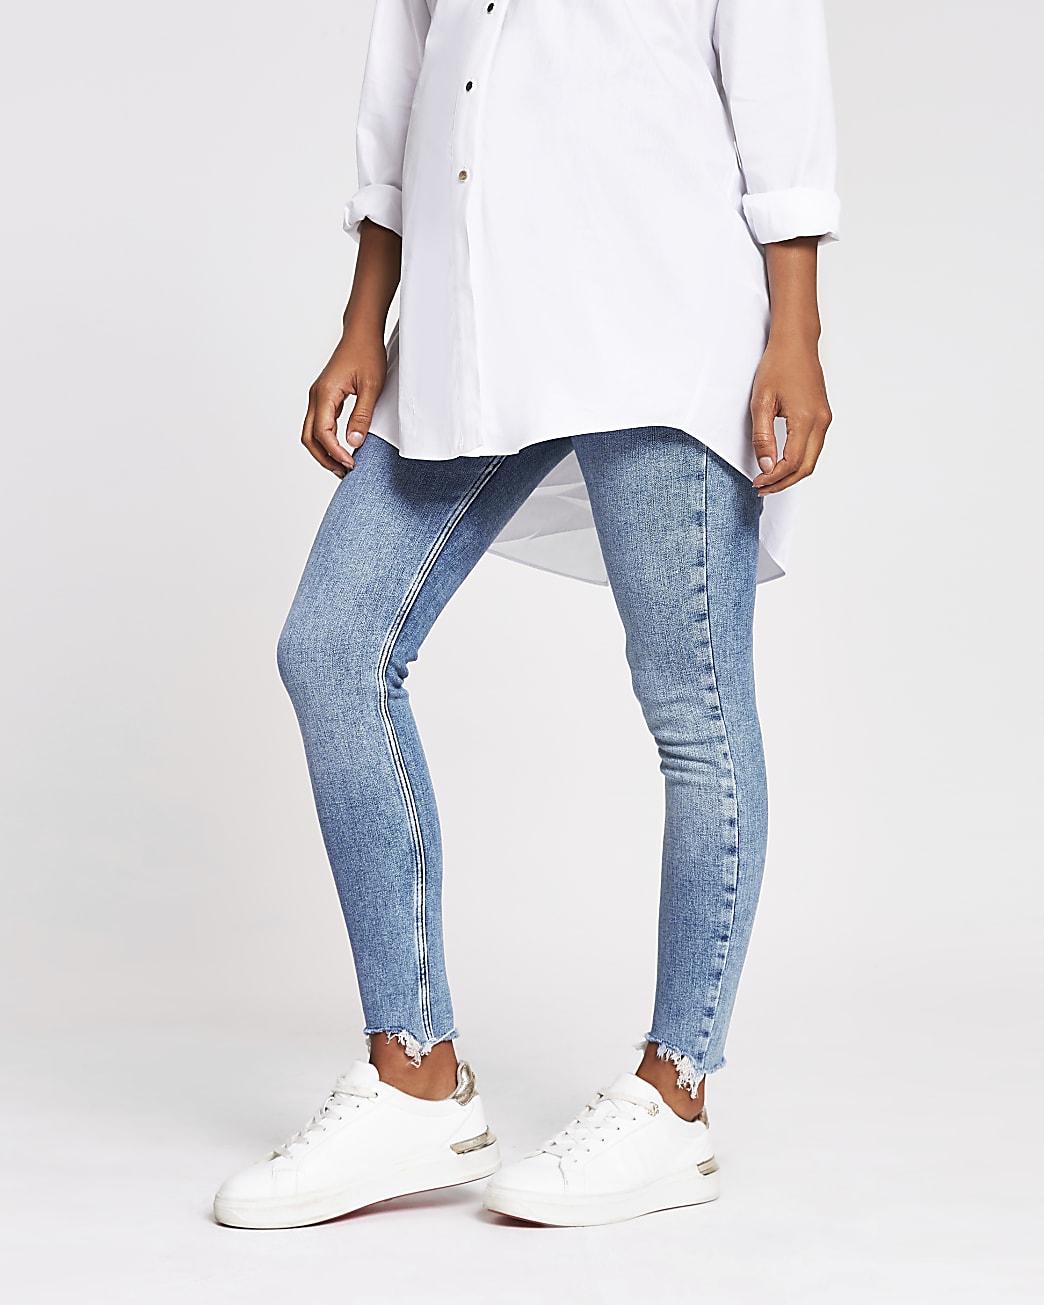 Light blue Amelie overbump maternity jeans